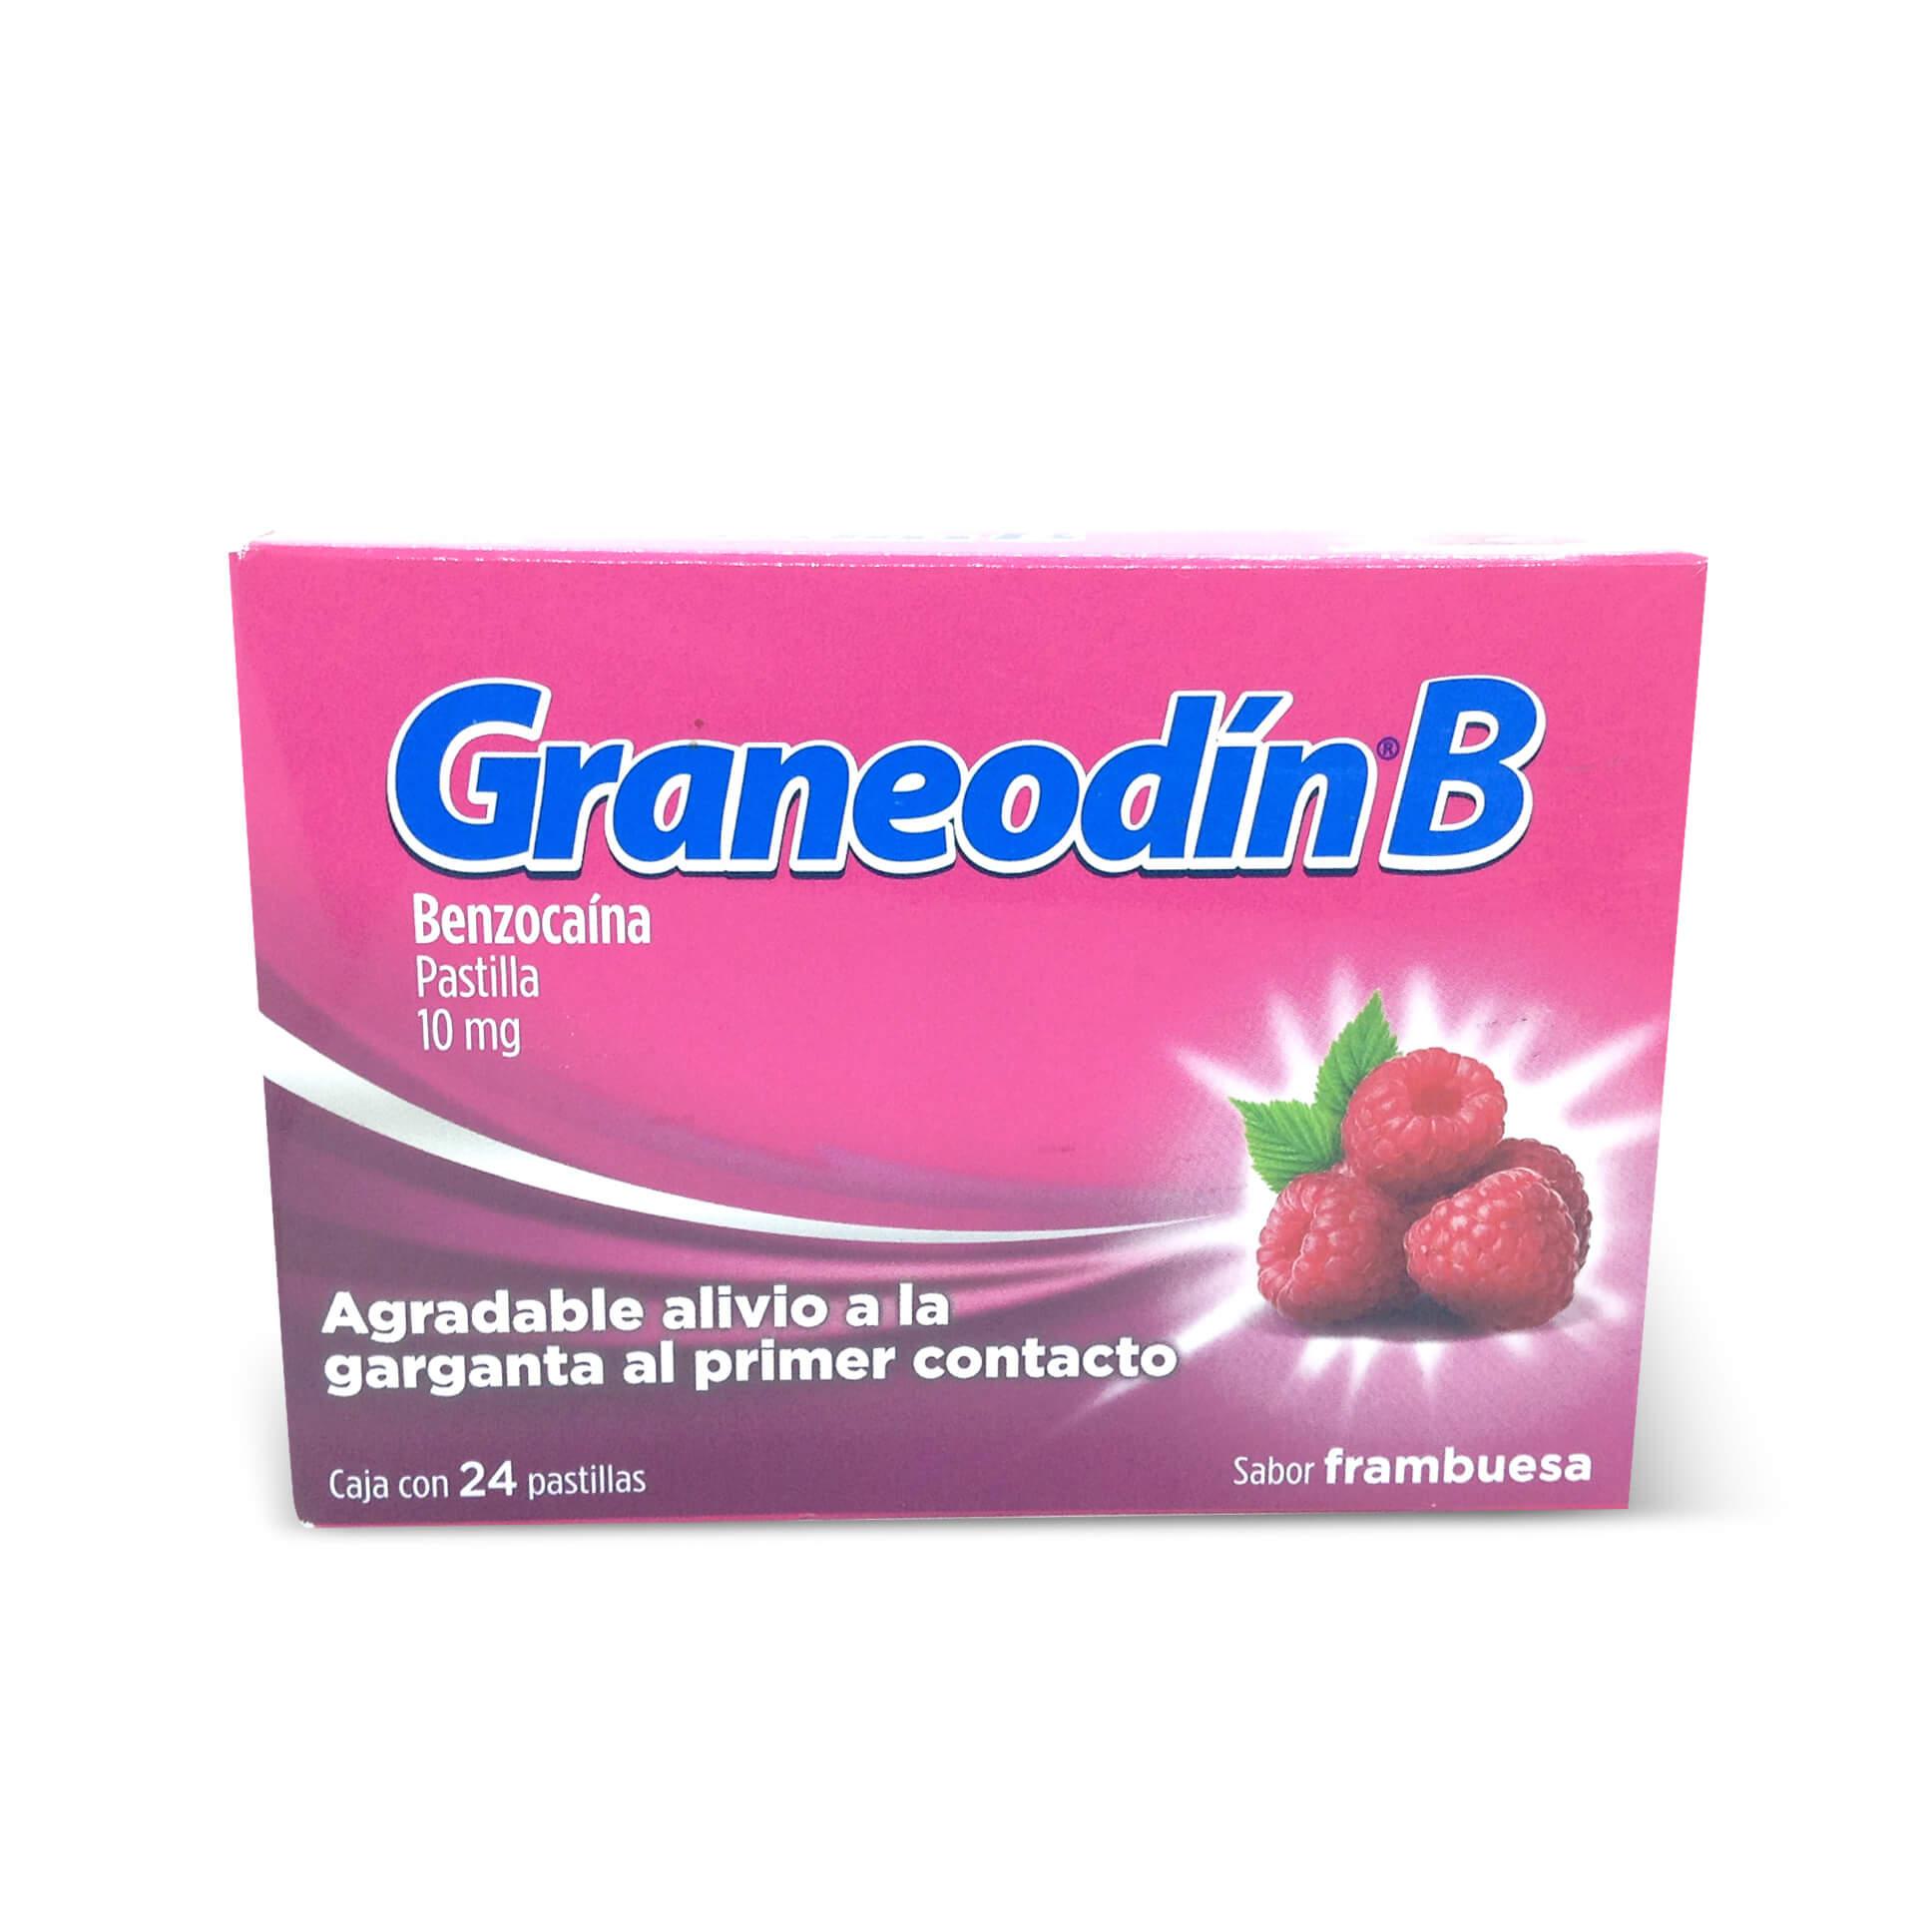 Graneodín B